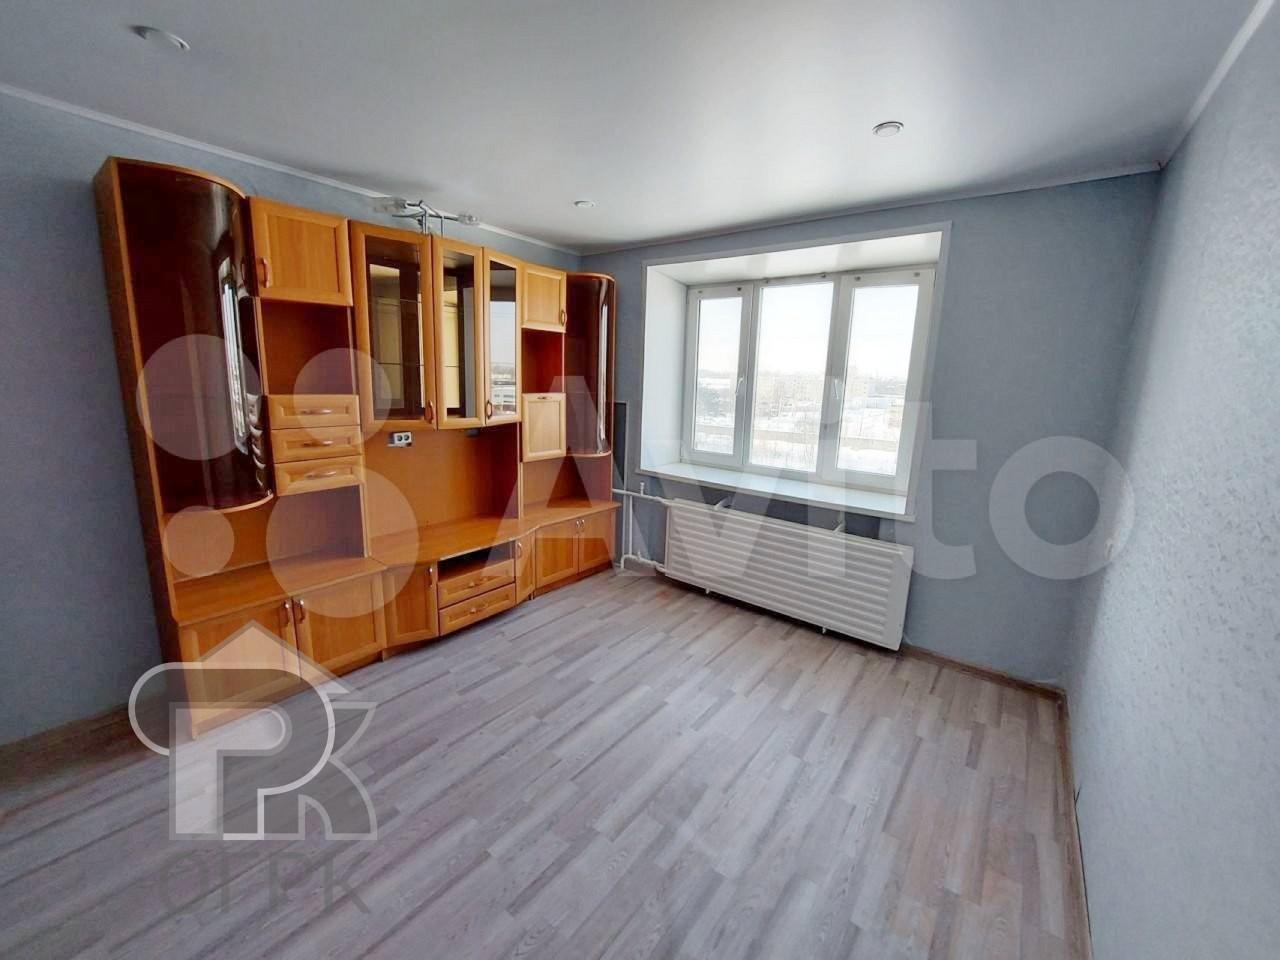 Купить 1-комнатную квартиру, город Казань, Казань, ул. Агрызская, д.82, №333148